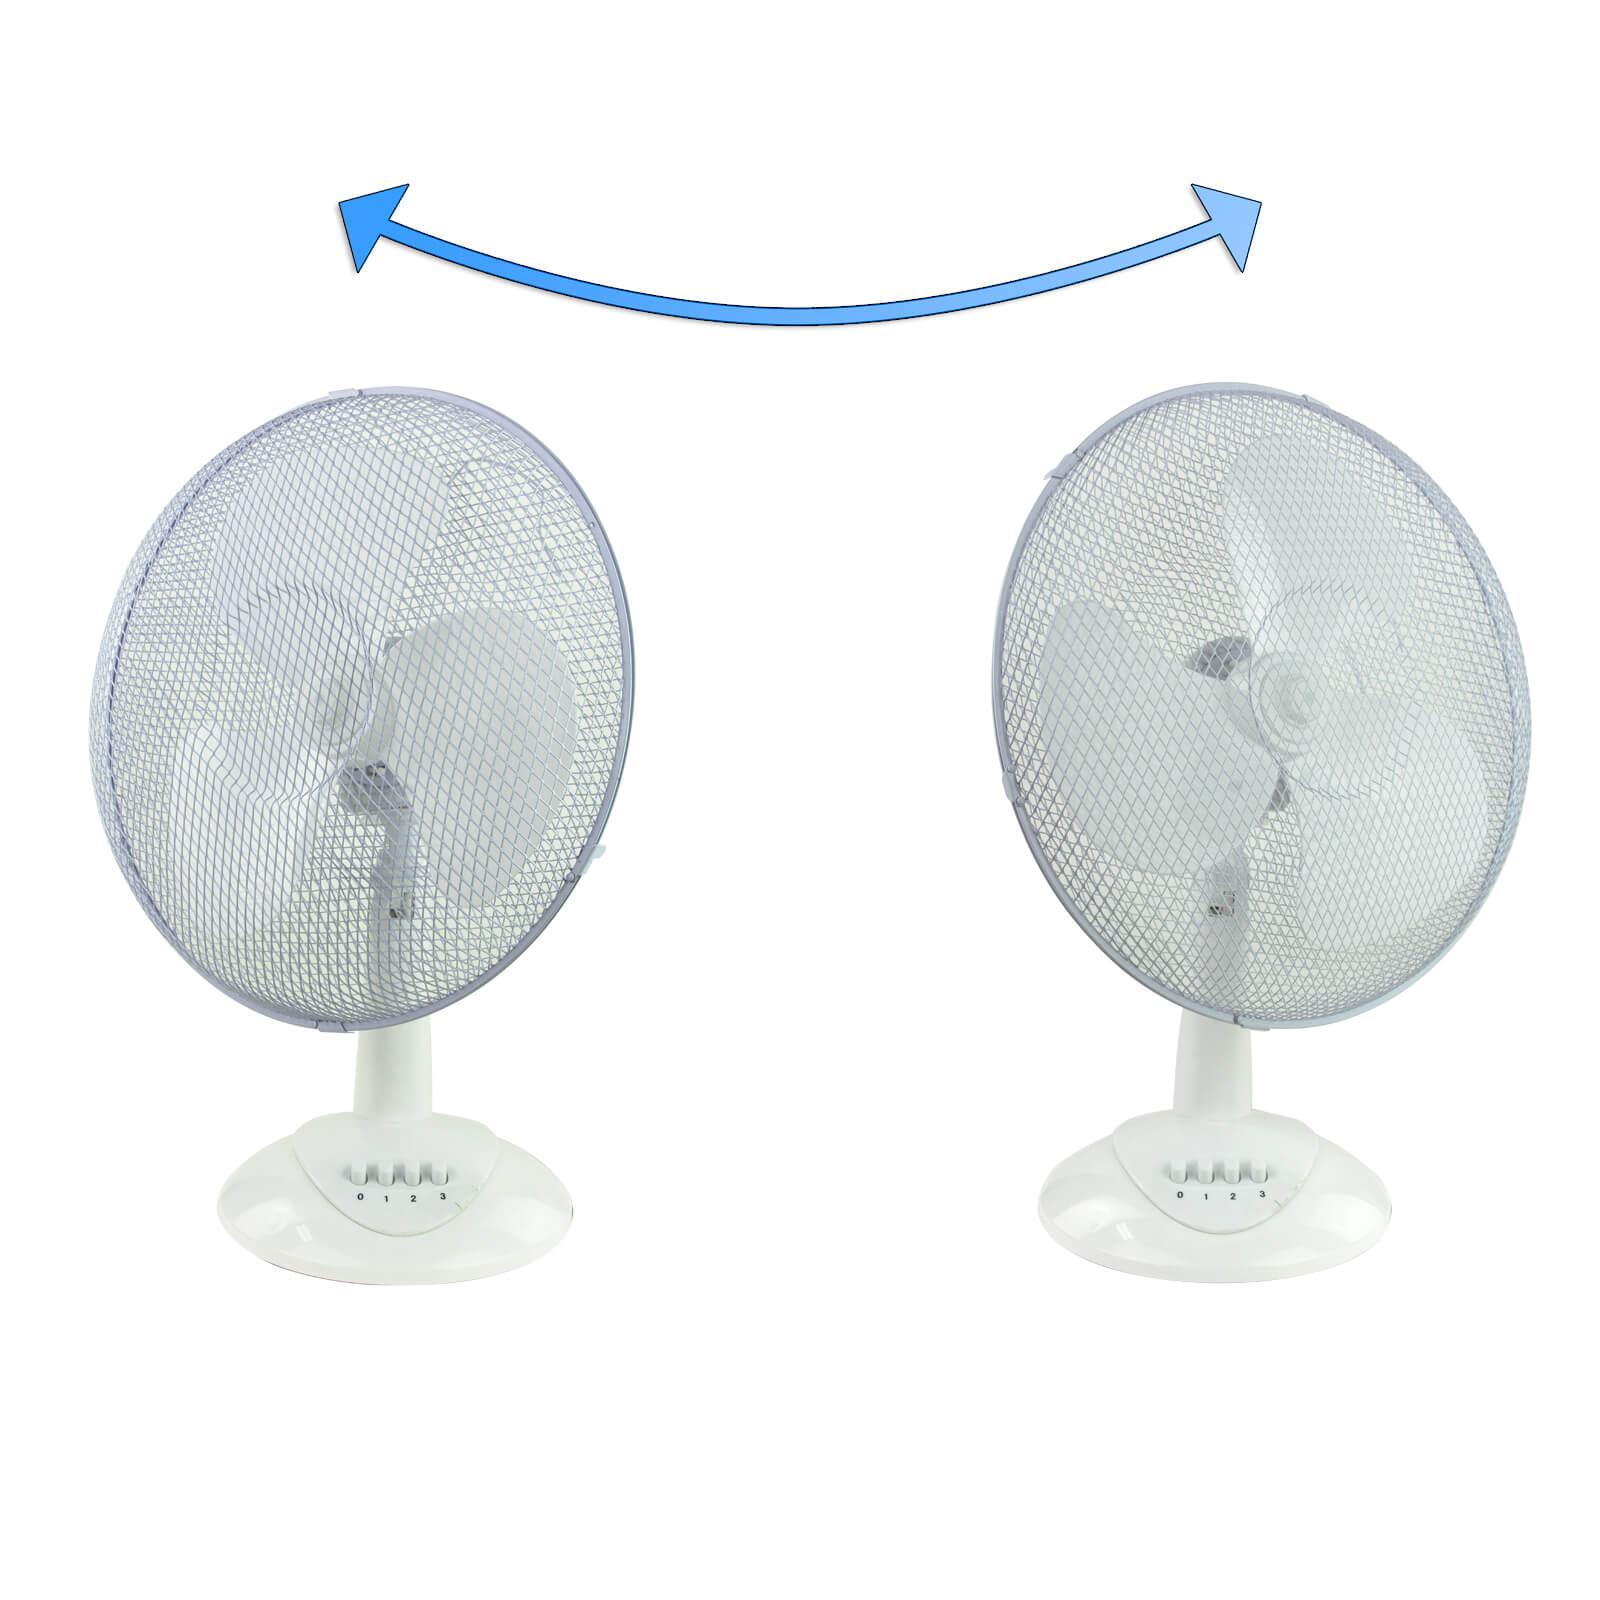 tischventilator ventilator 45 watt 34 cm. Black Bedroom Furniture Sets. Home Design Ideas